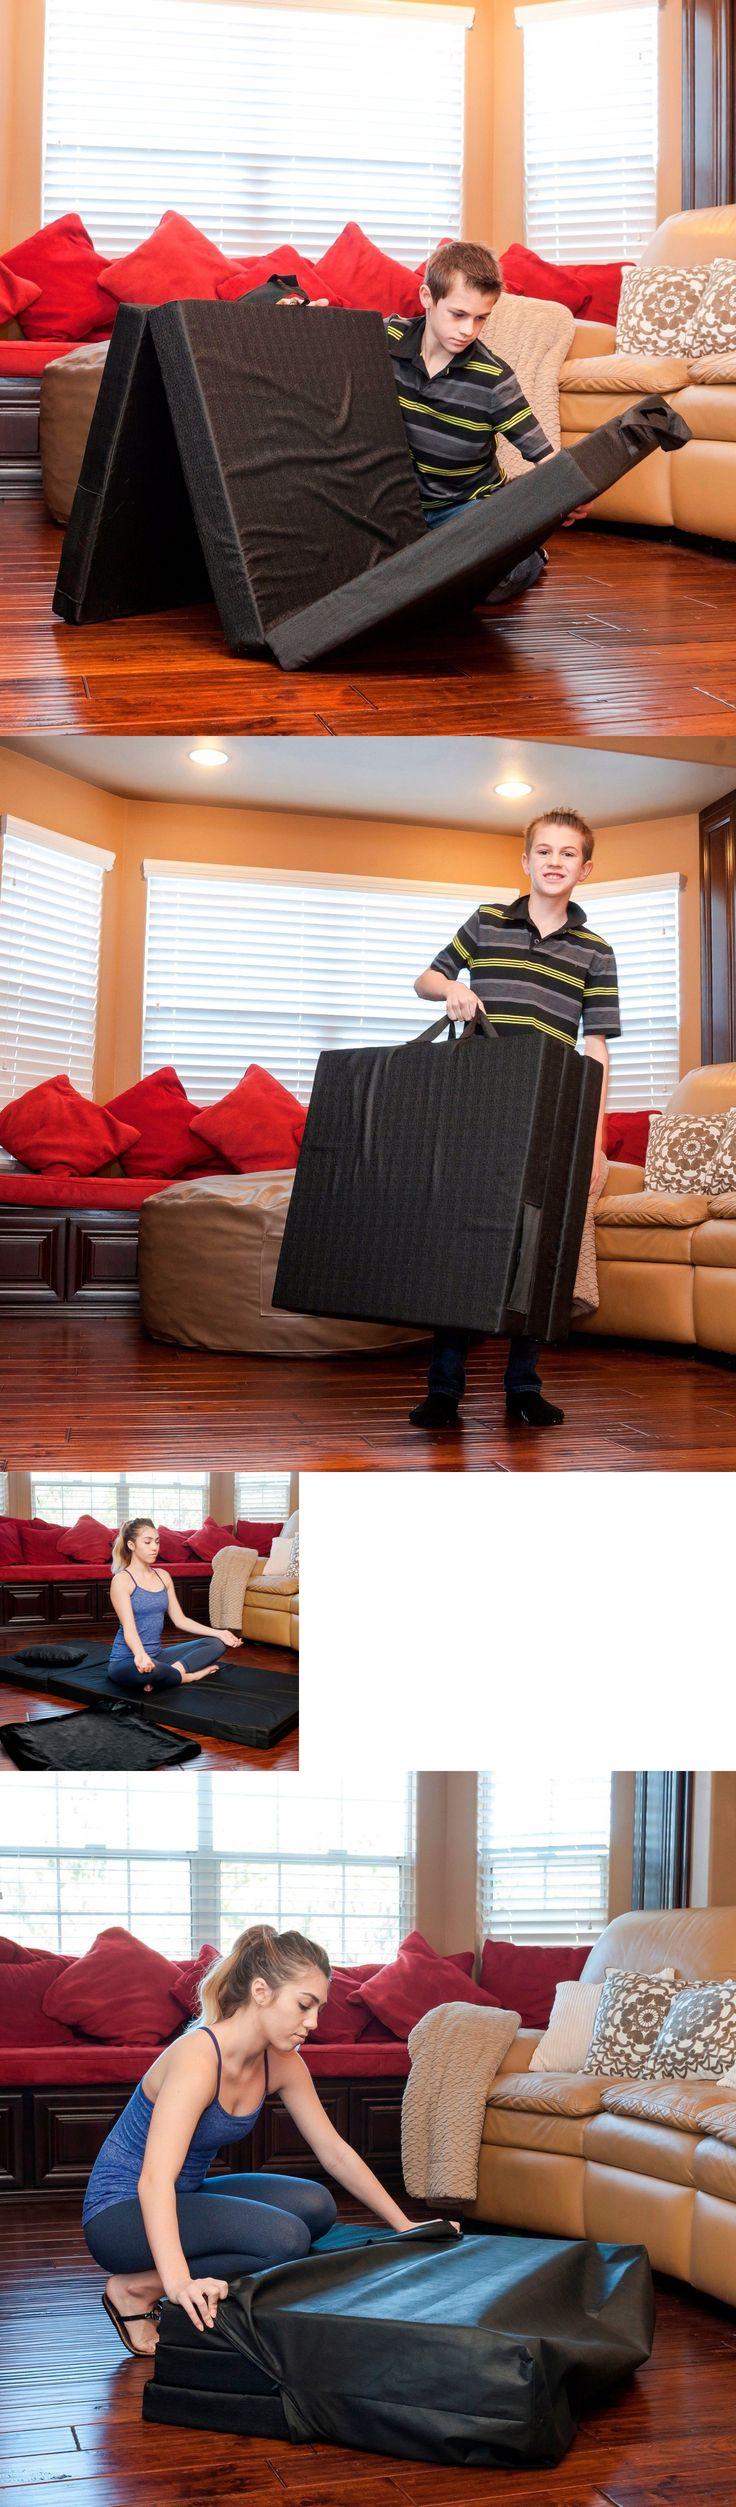 Floor mats to sleep on - Mattresses And Pads 36114 Sleepover Bed Foam Floor Mats For Kids Sleeping Pad Folding Camping